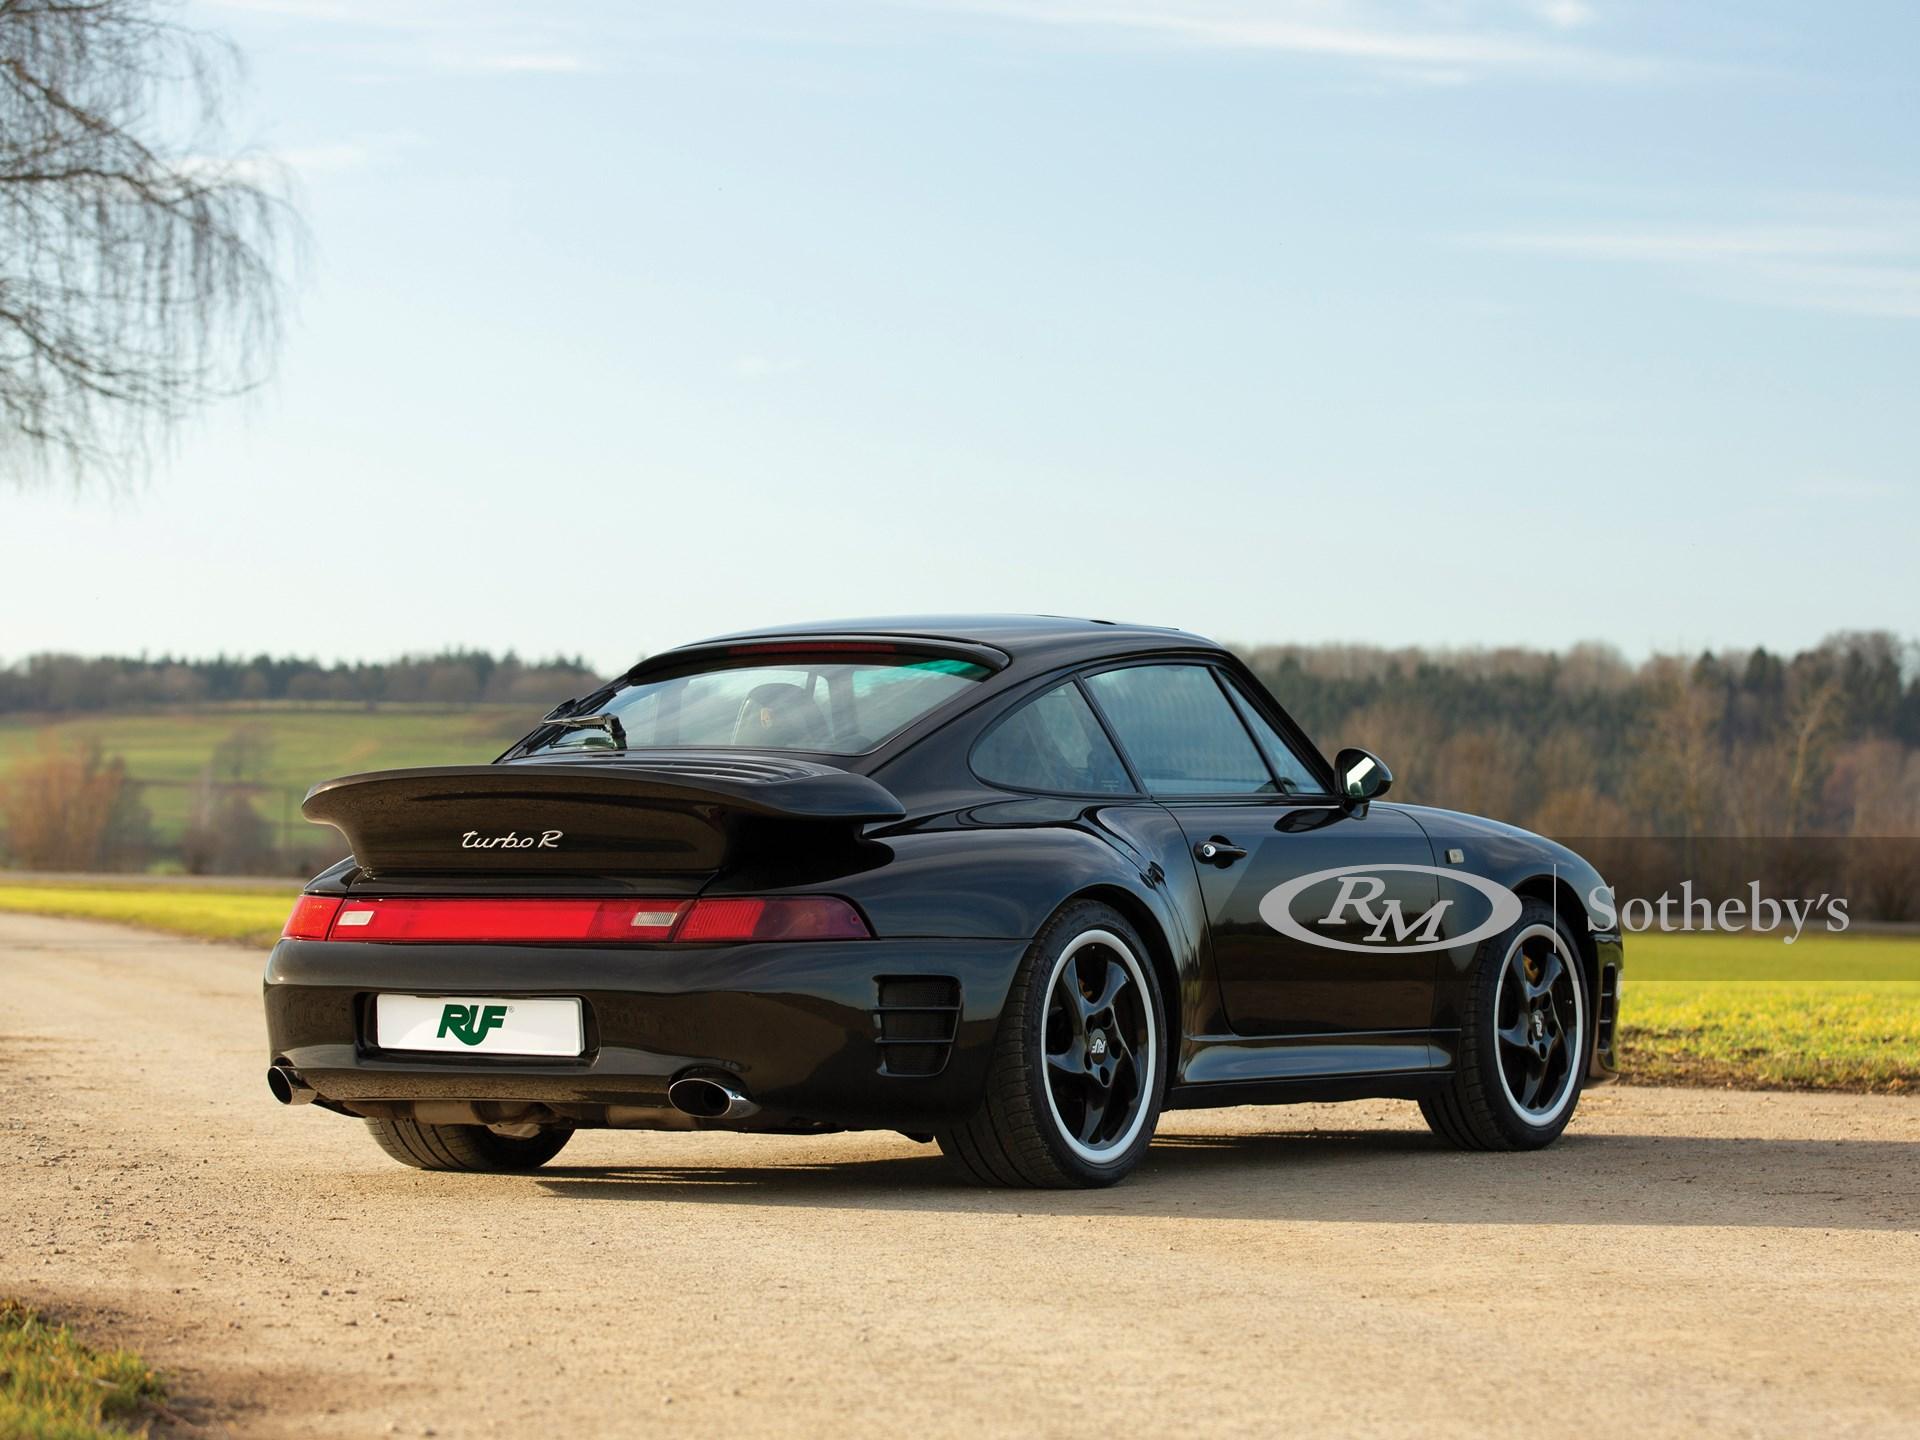 1998 Porsche RUF Turbo R  -